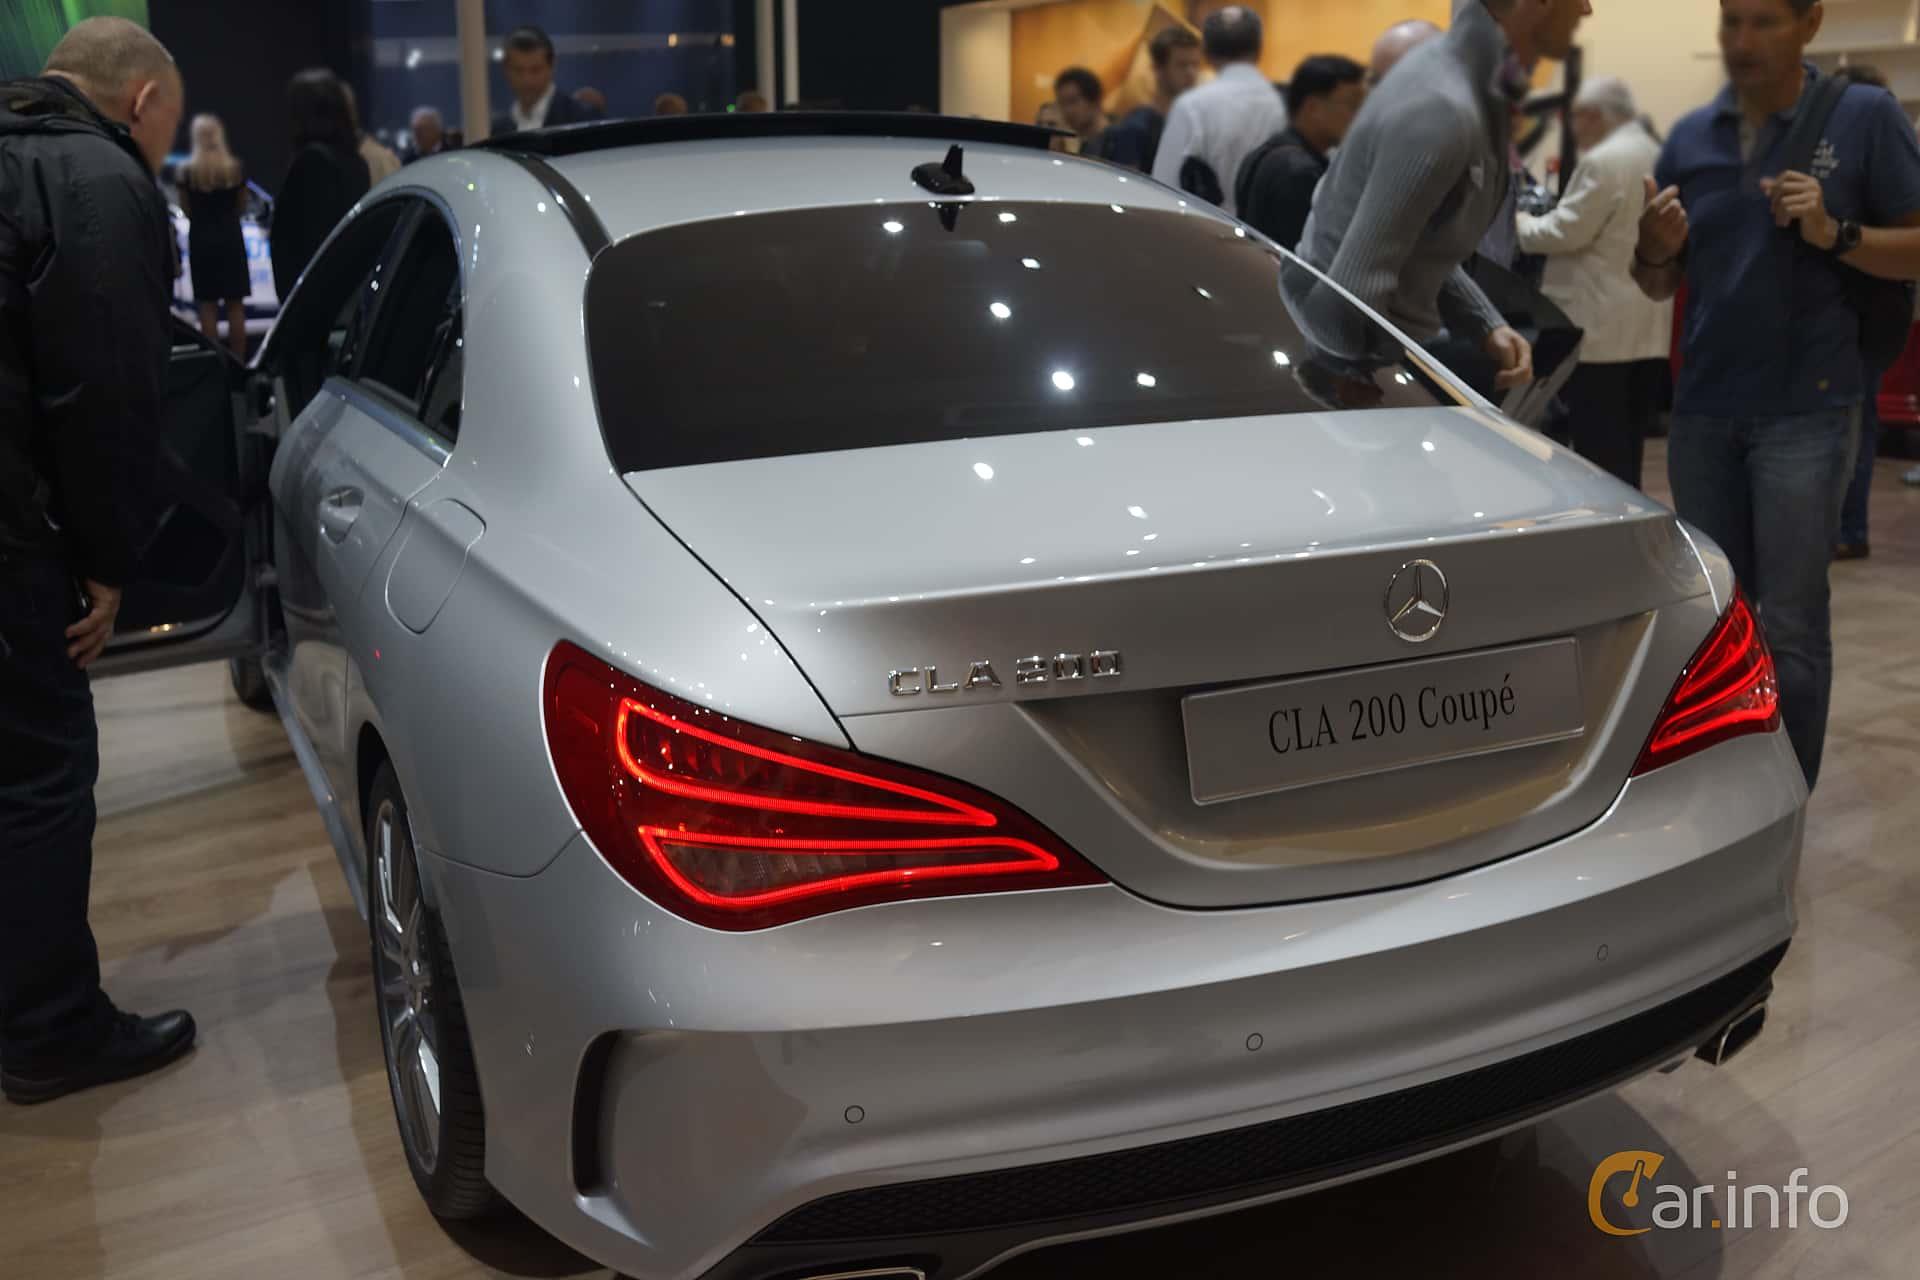 Mercedes Benz Cla 200 Manual 156hp 2016